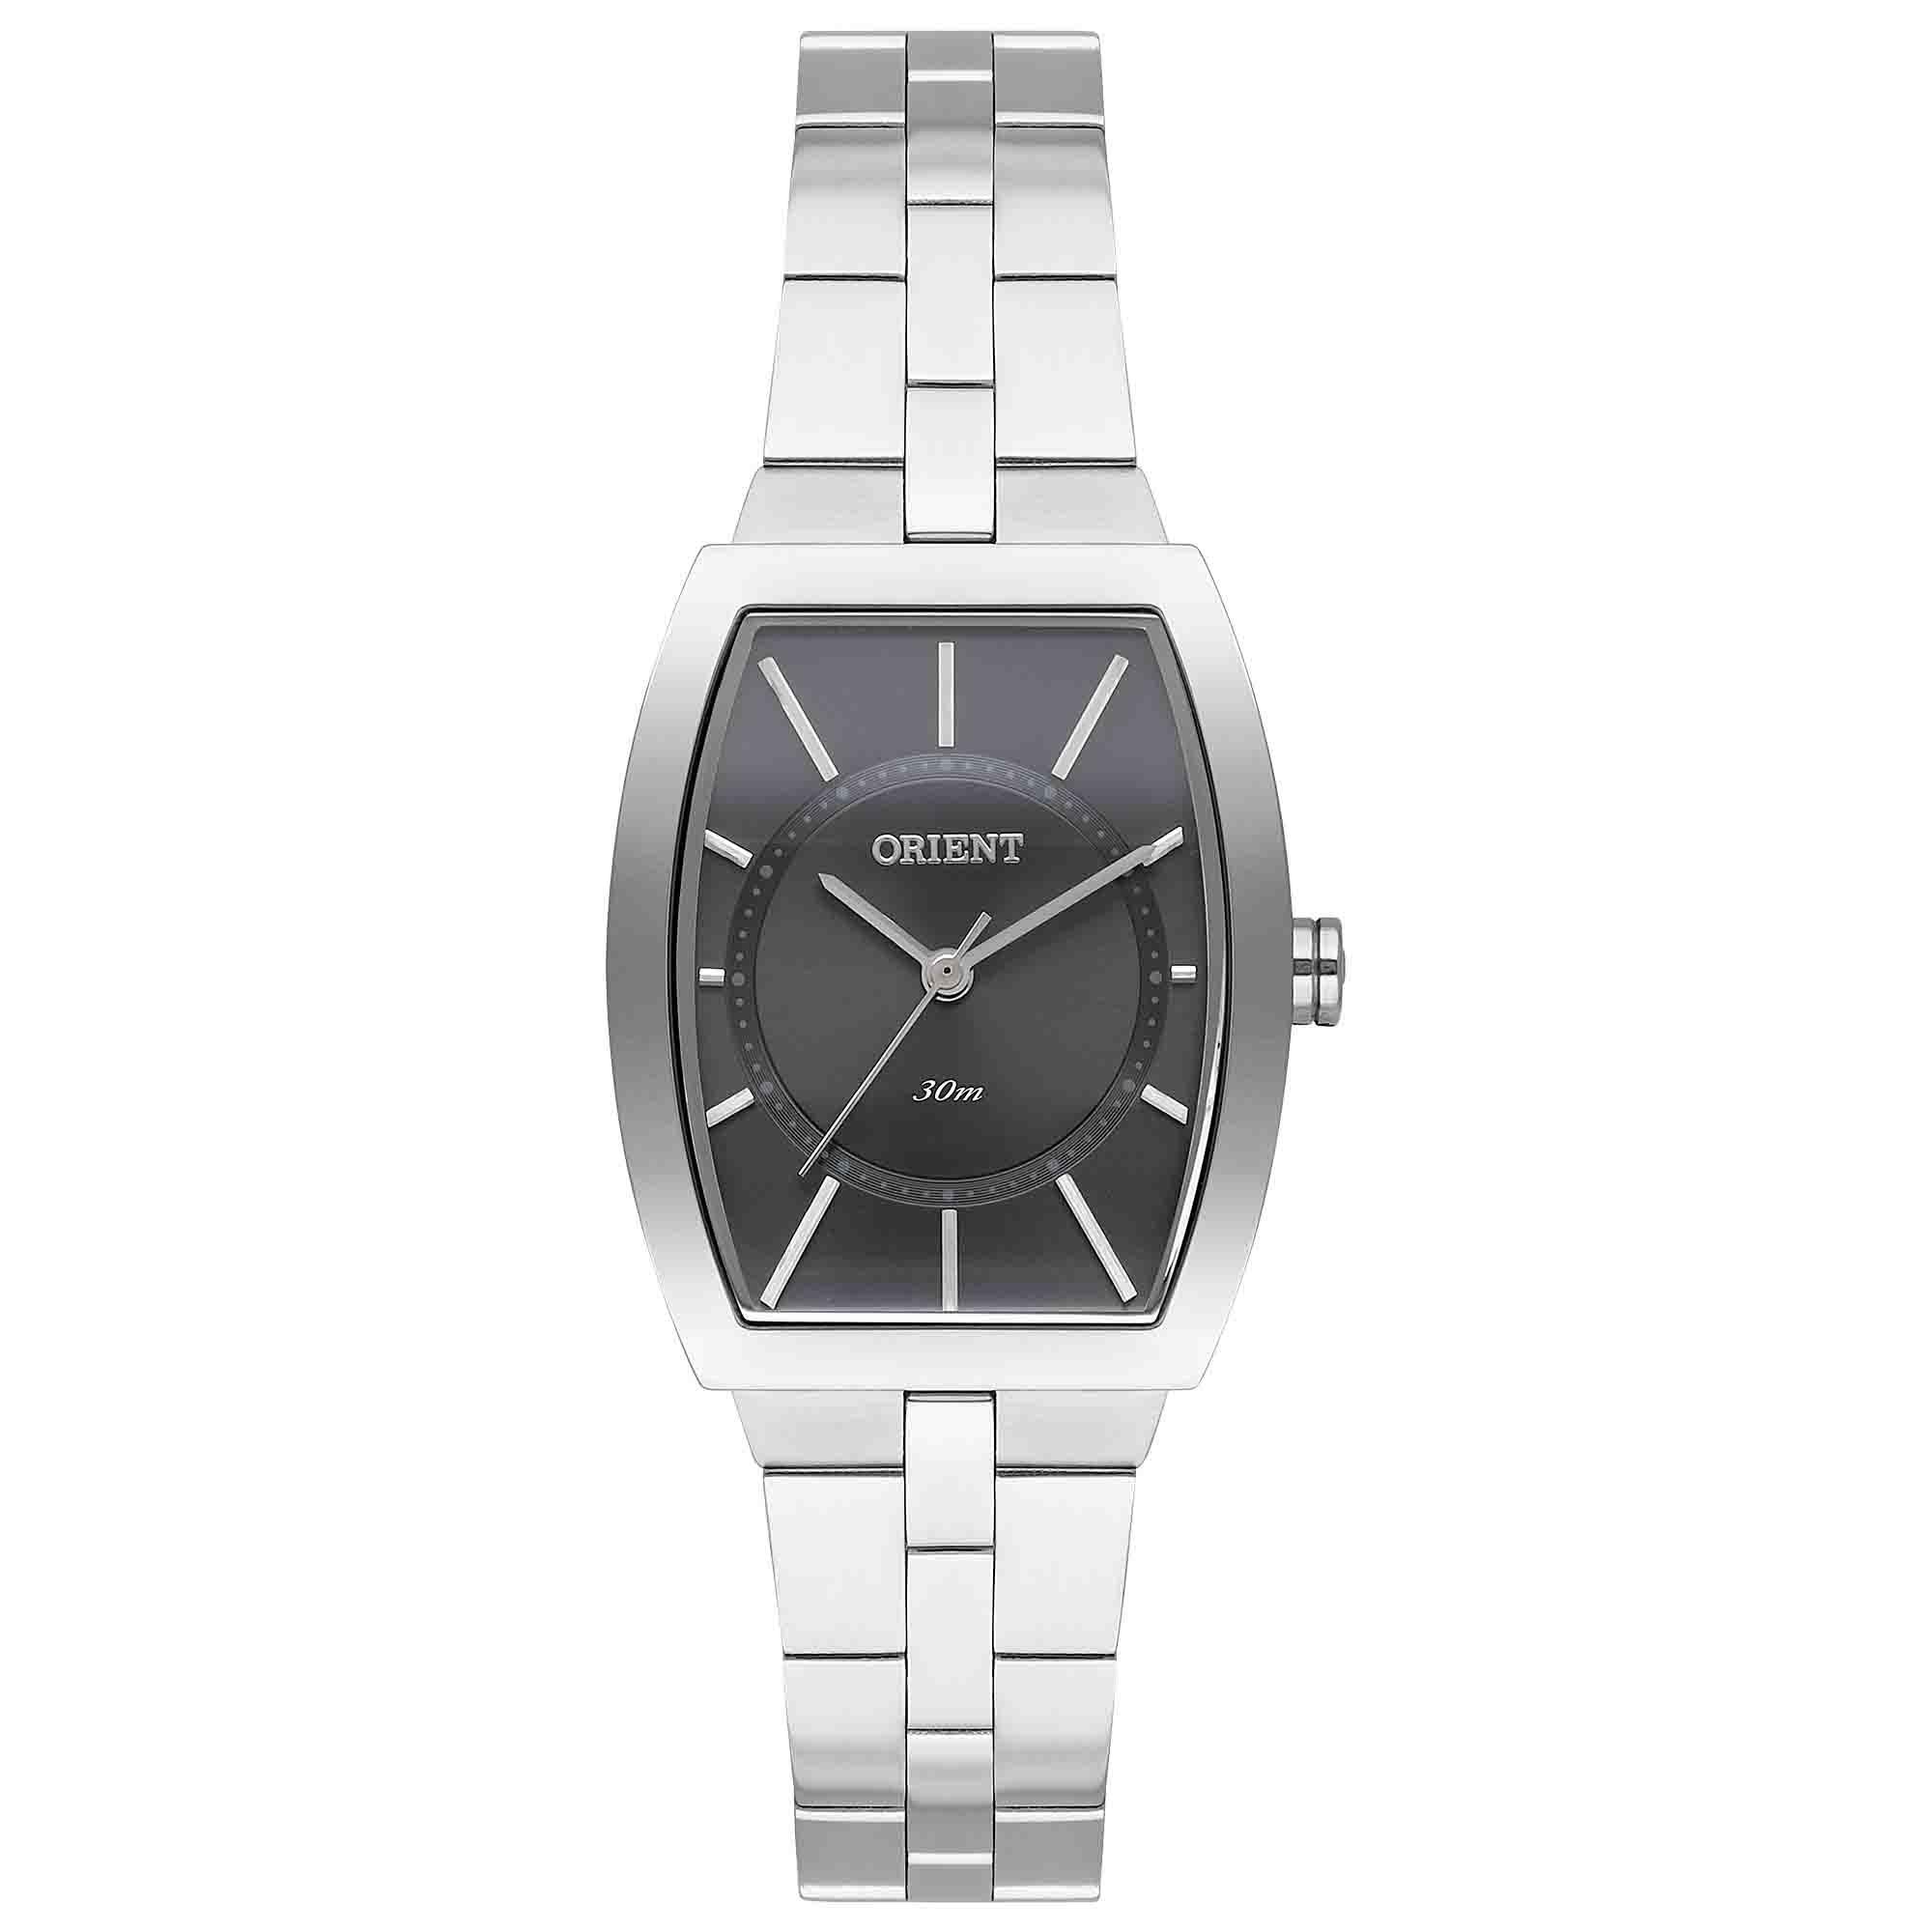 Relógio Feminino Orient LBSS0083 G1SX